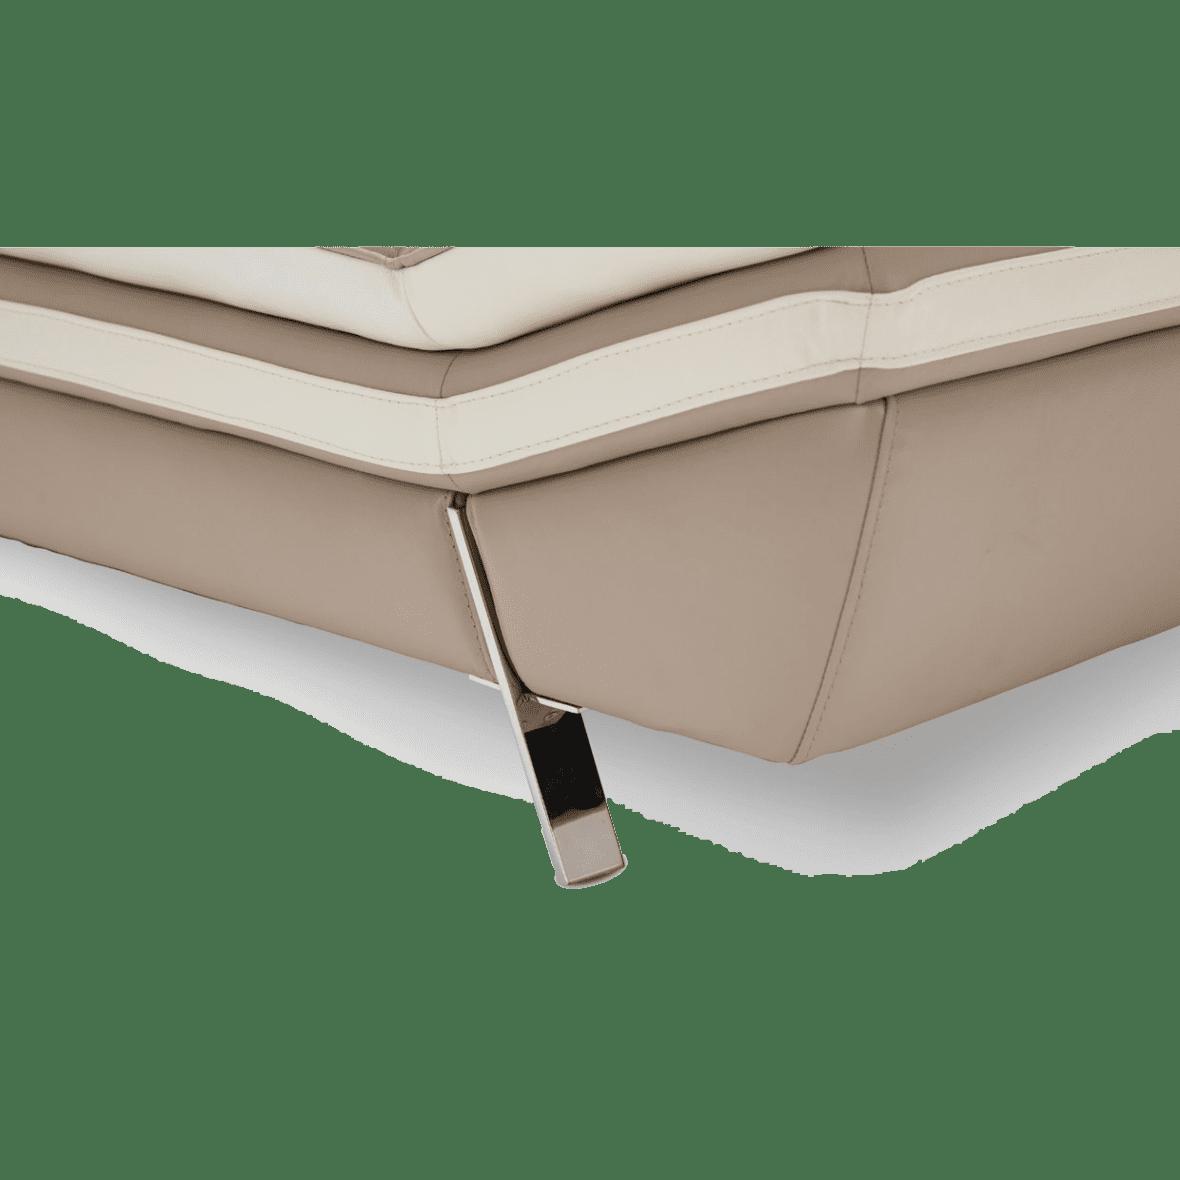 Carlin софа стандарт,цвет Taupe, база нерж сталь